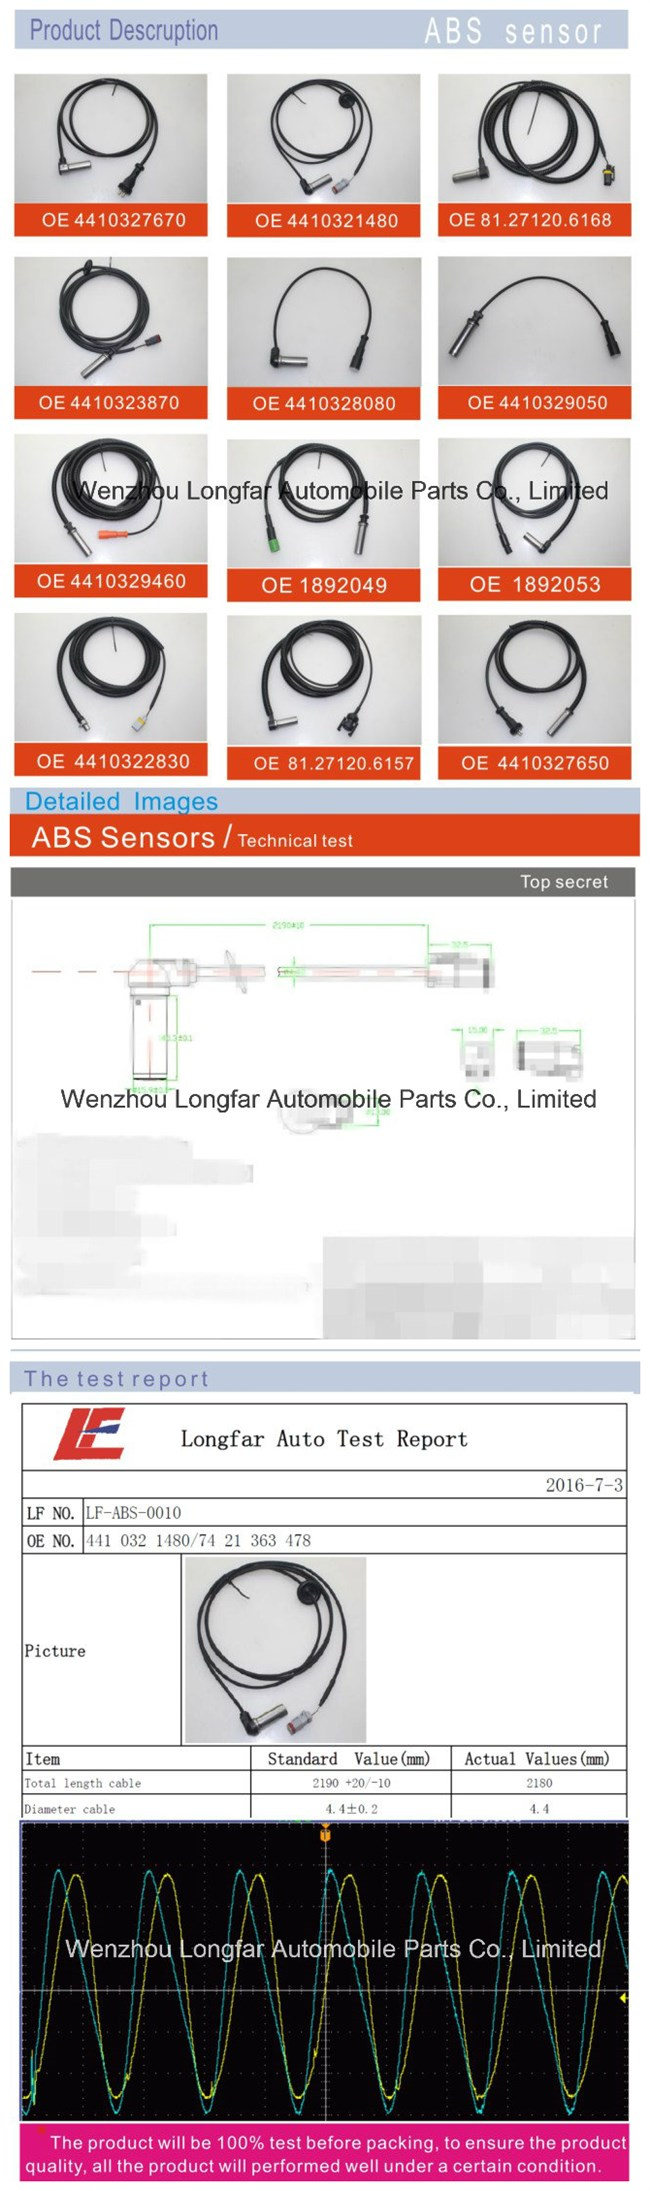 Auto Crankshaft Position Sensor Engine Speed Transducer Indicator Sensor 19245473, 5s1362, Ss10043, Css223, 296032 for GM, Napa, Delphi, Kemparts, Masterpro